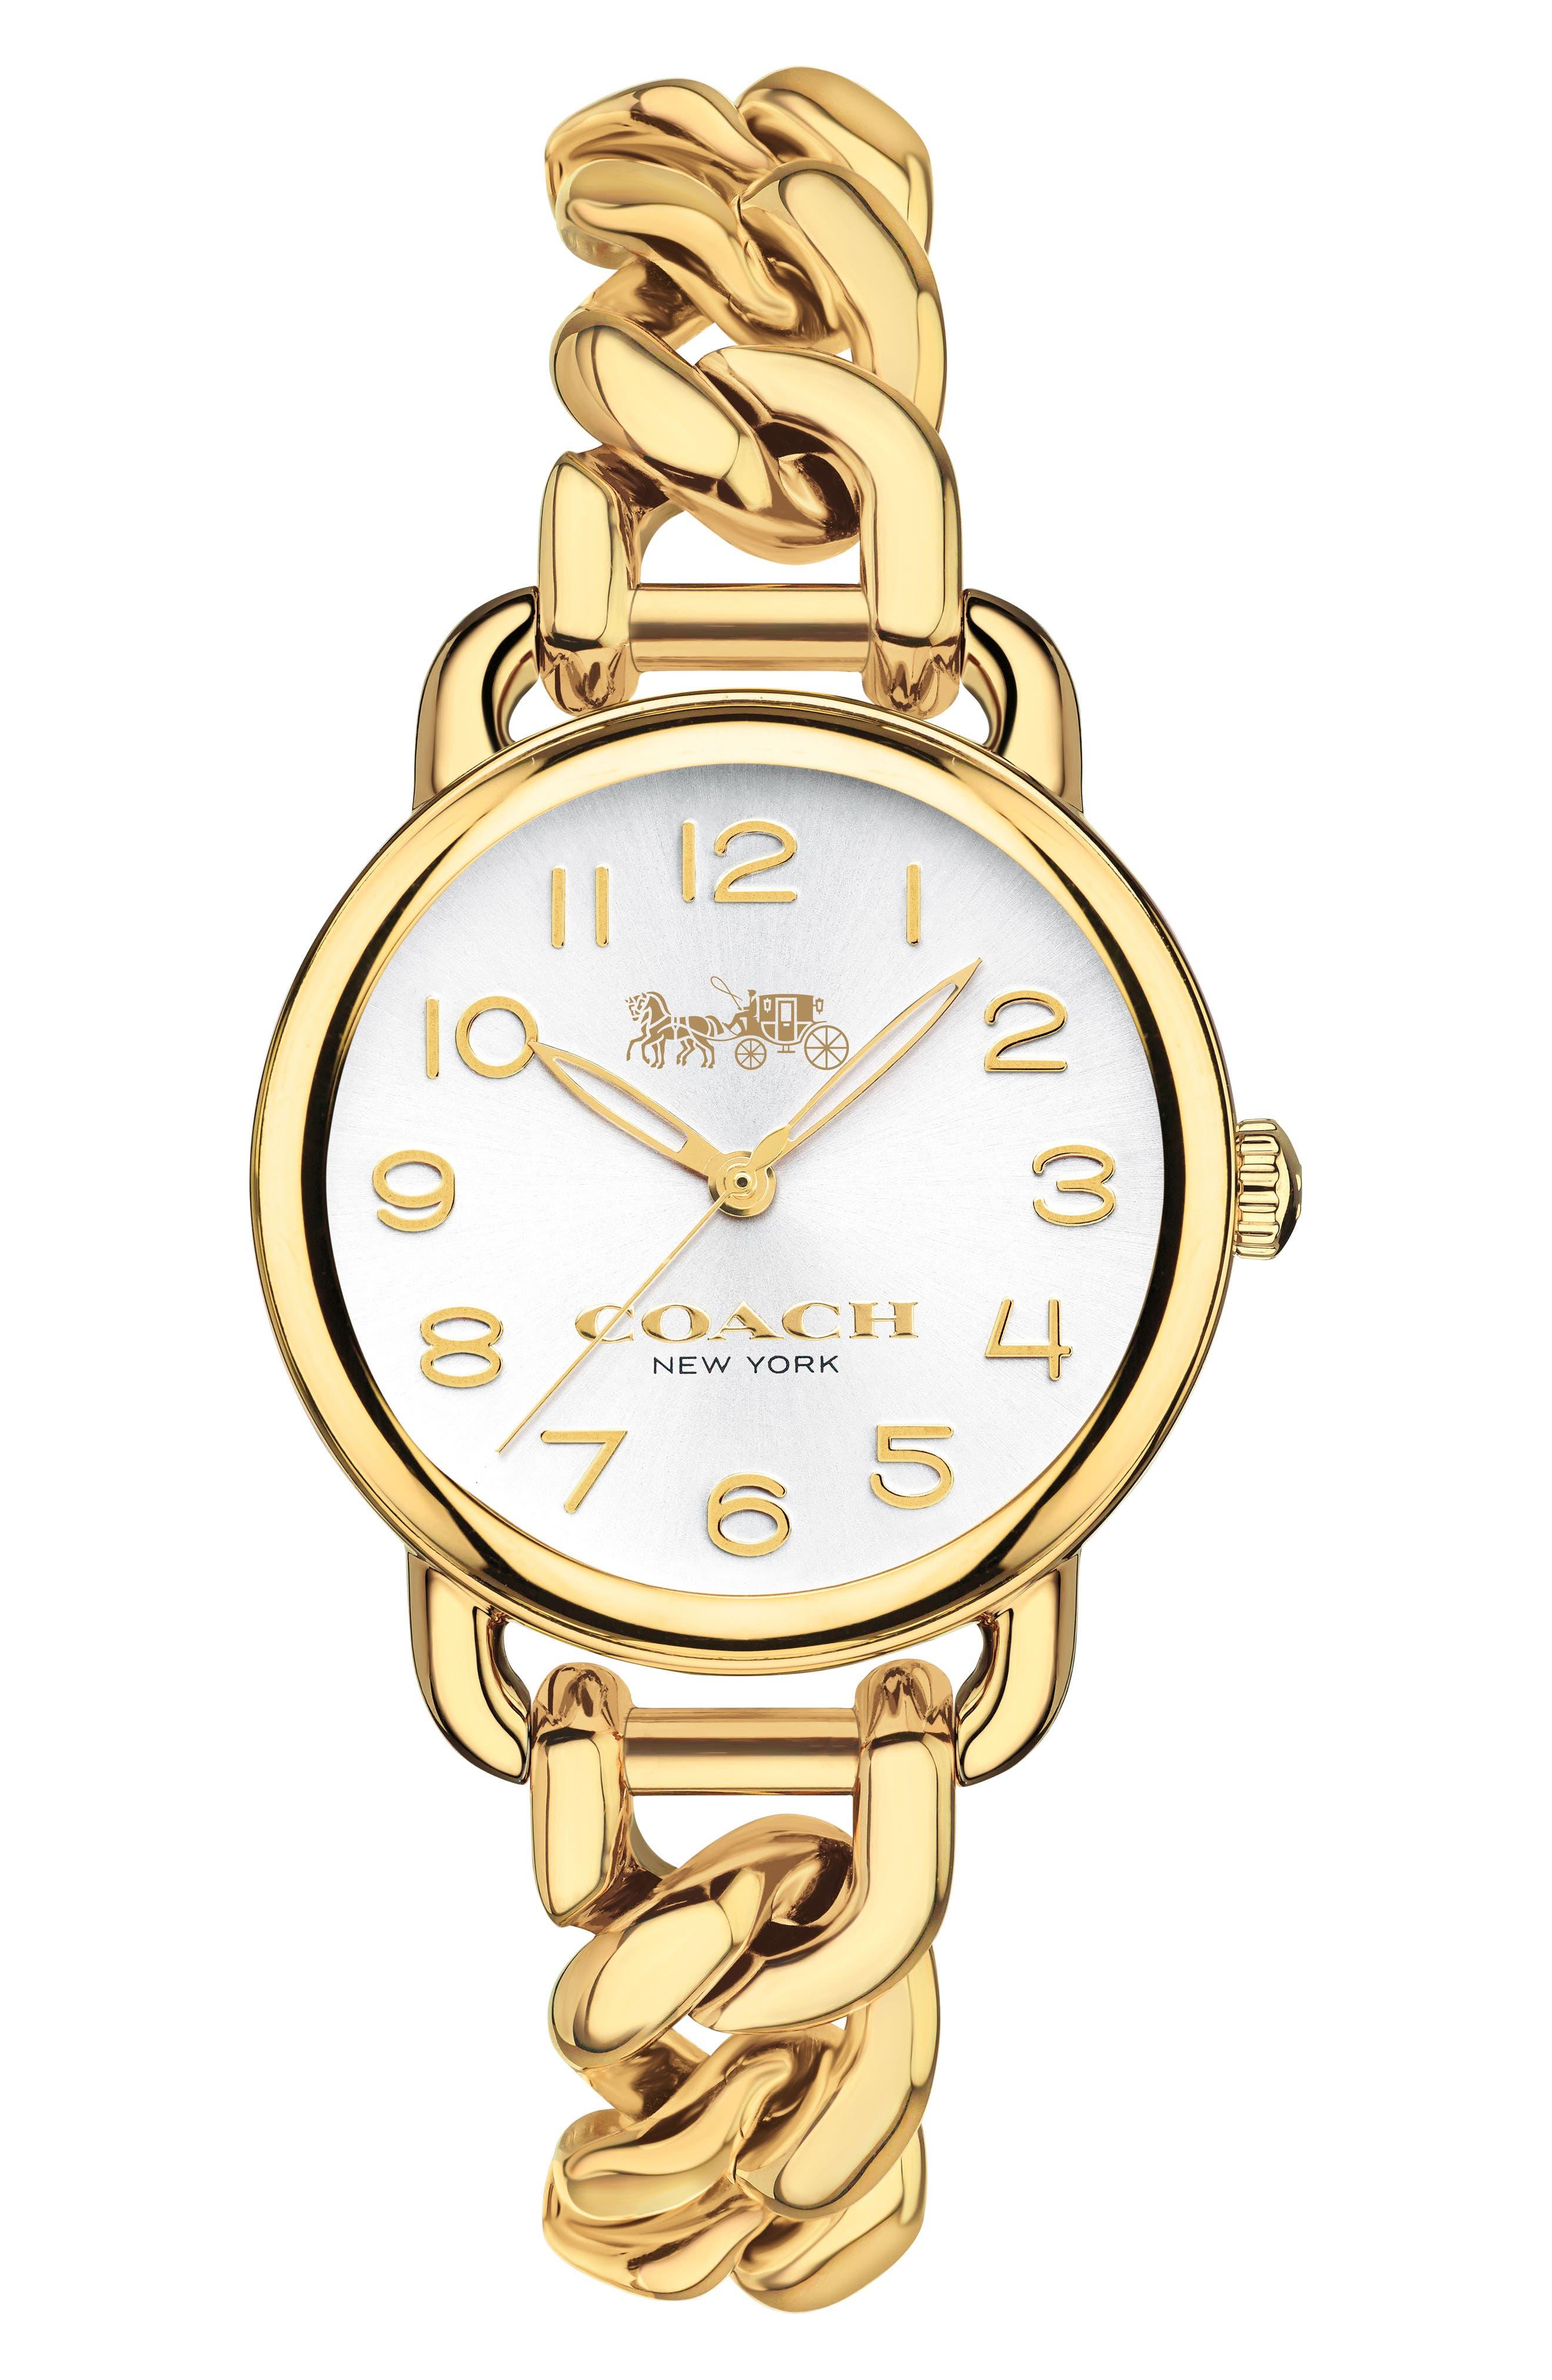 Main Image - COACH Delancey Chain Bracelet Watch, 28mm